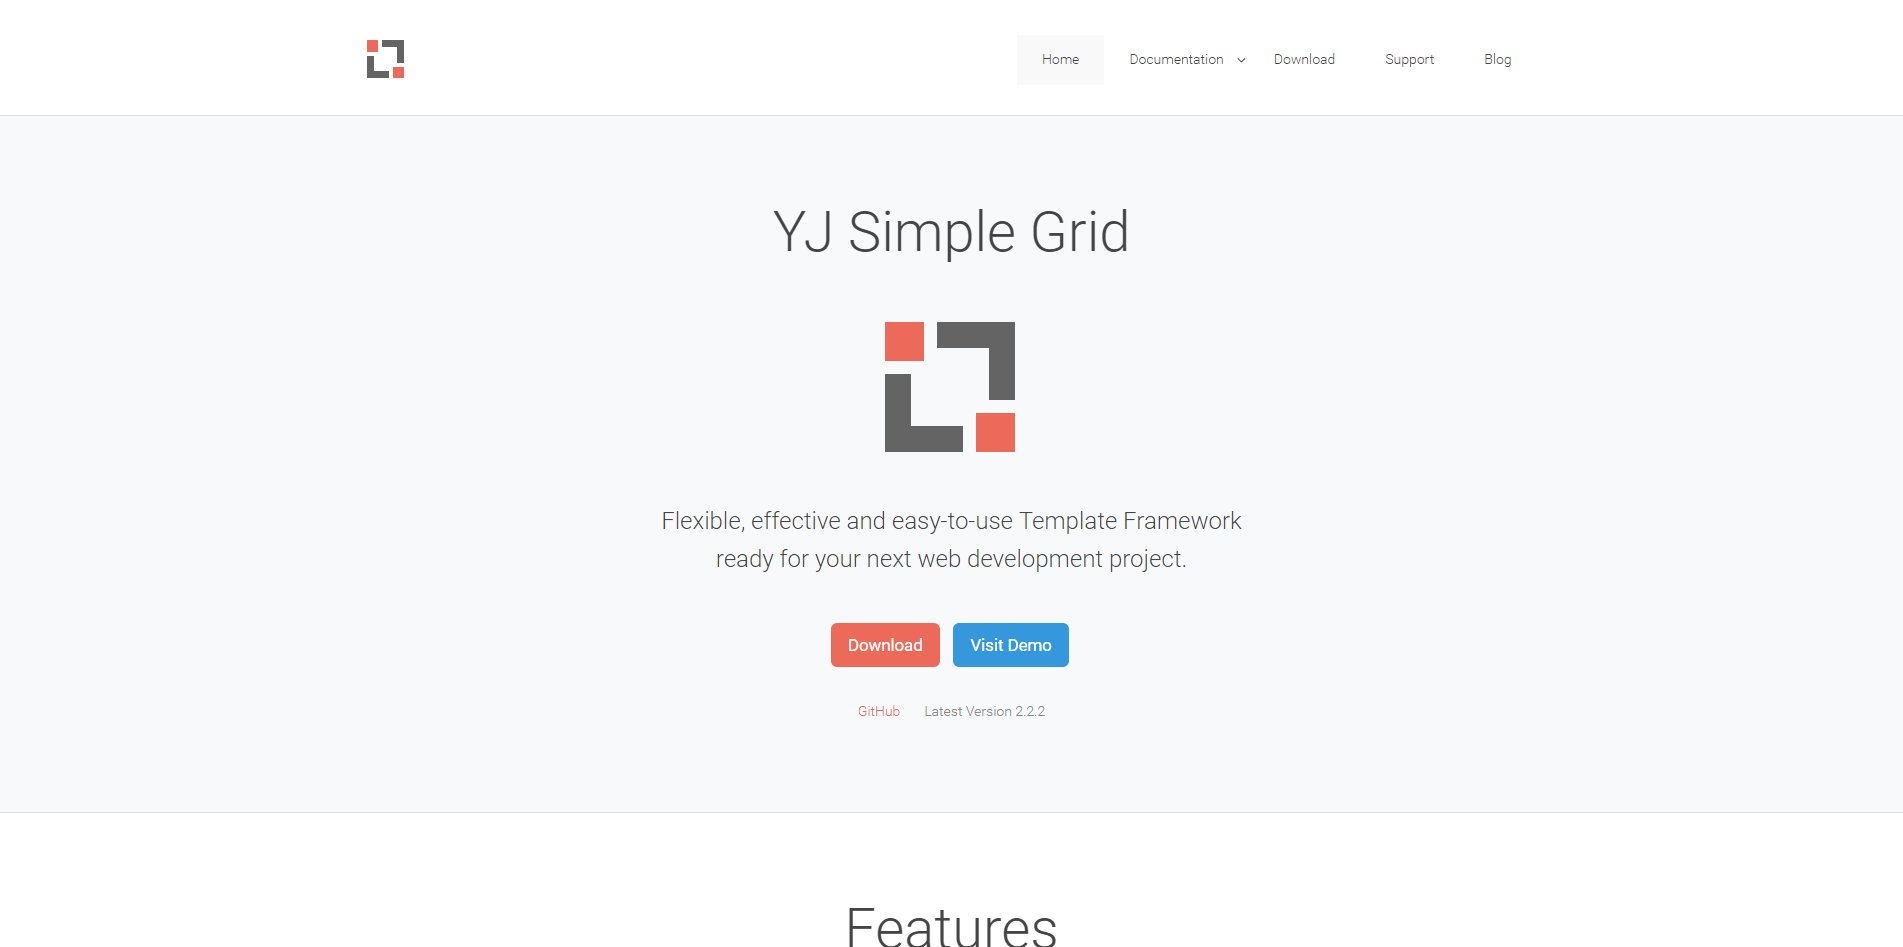 YJSG Template Framework